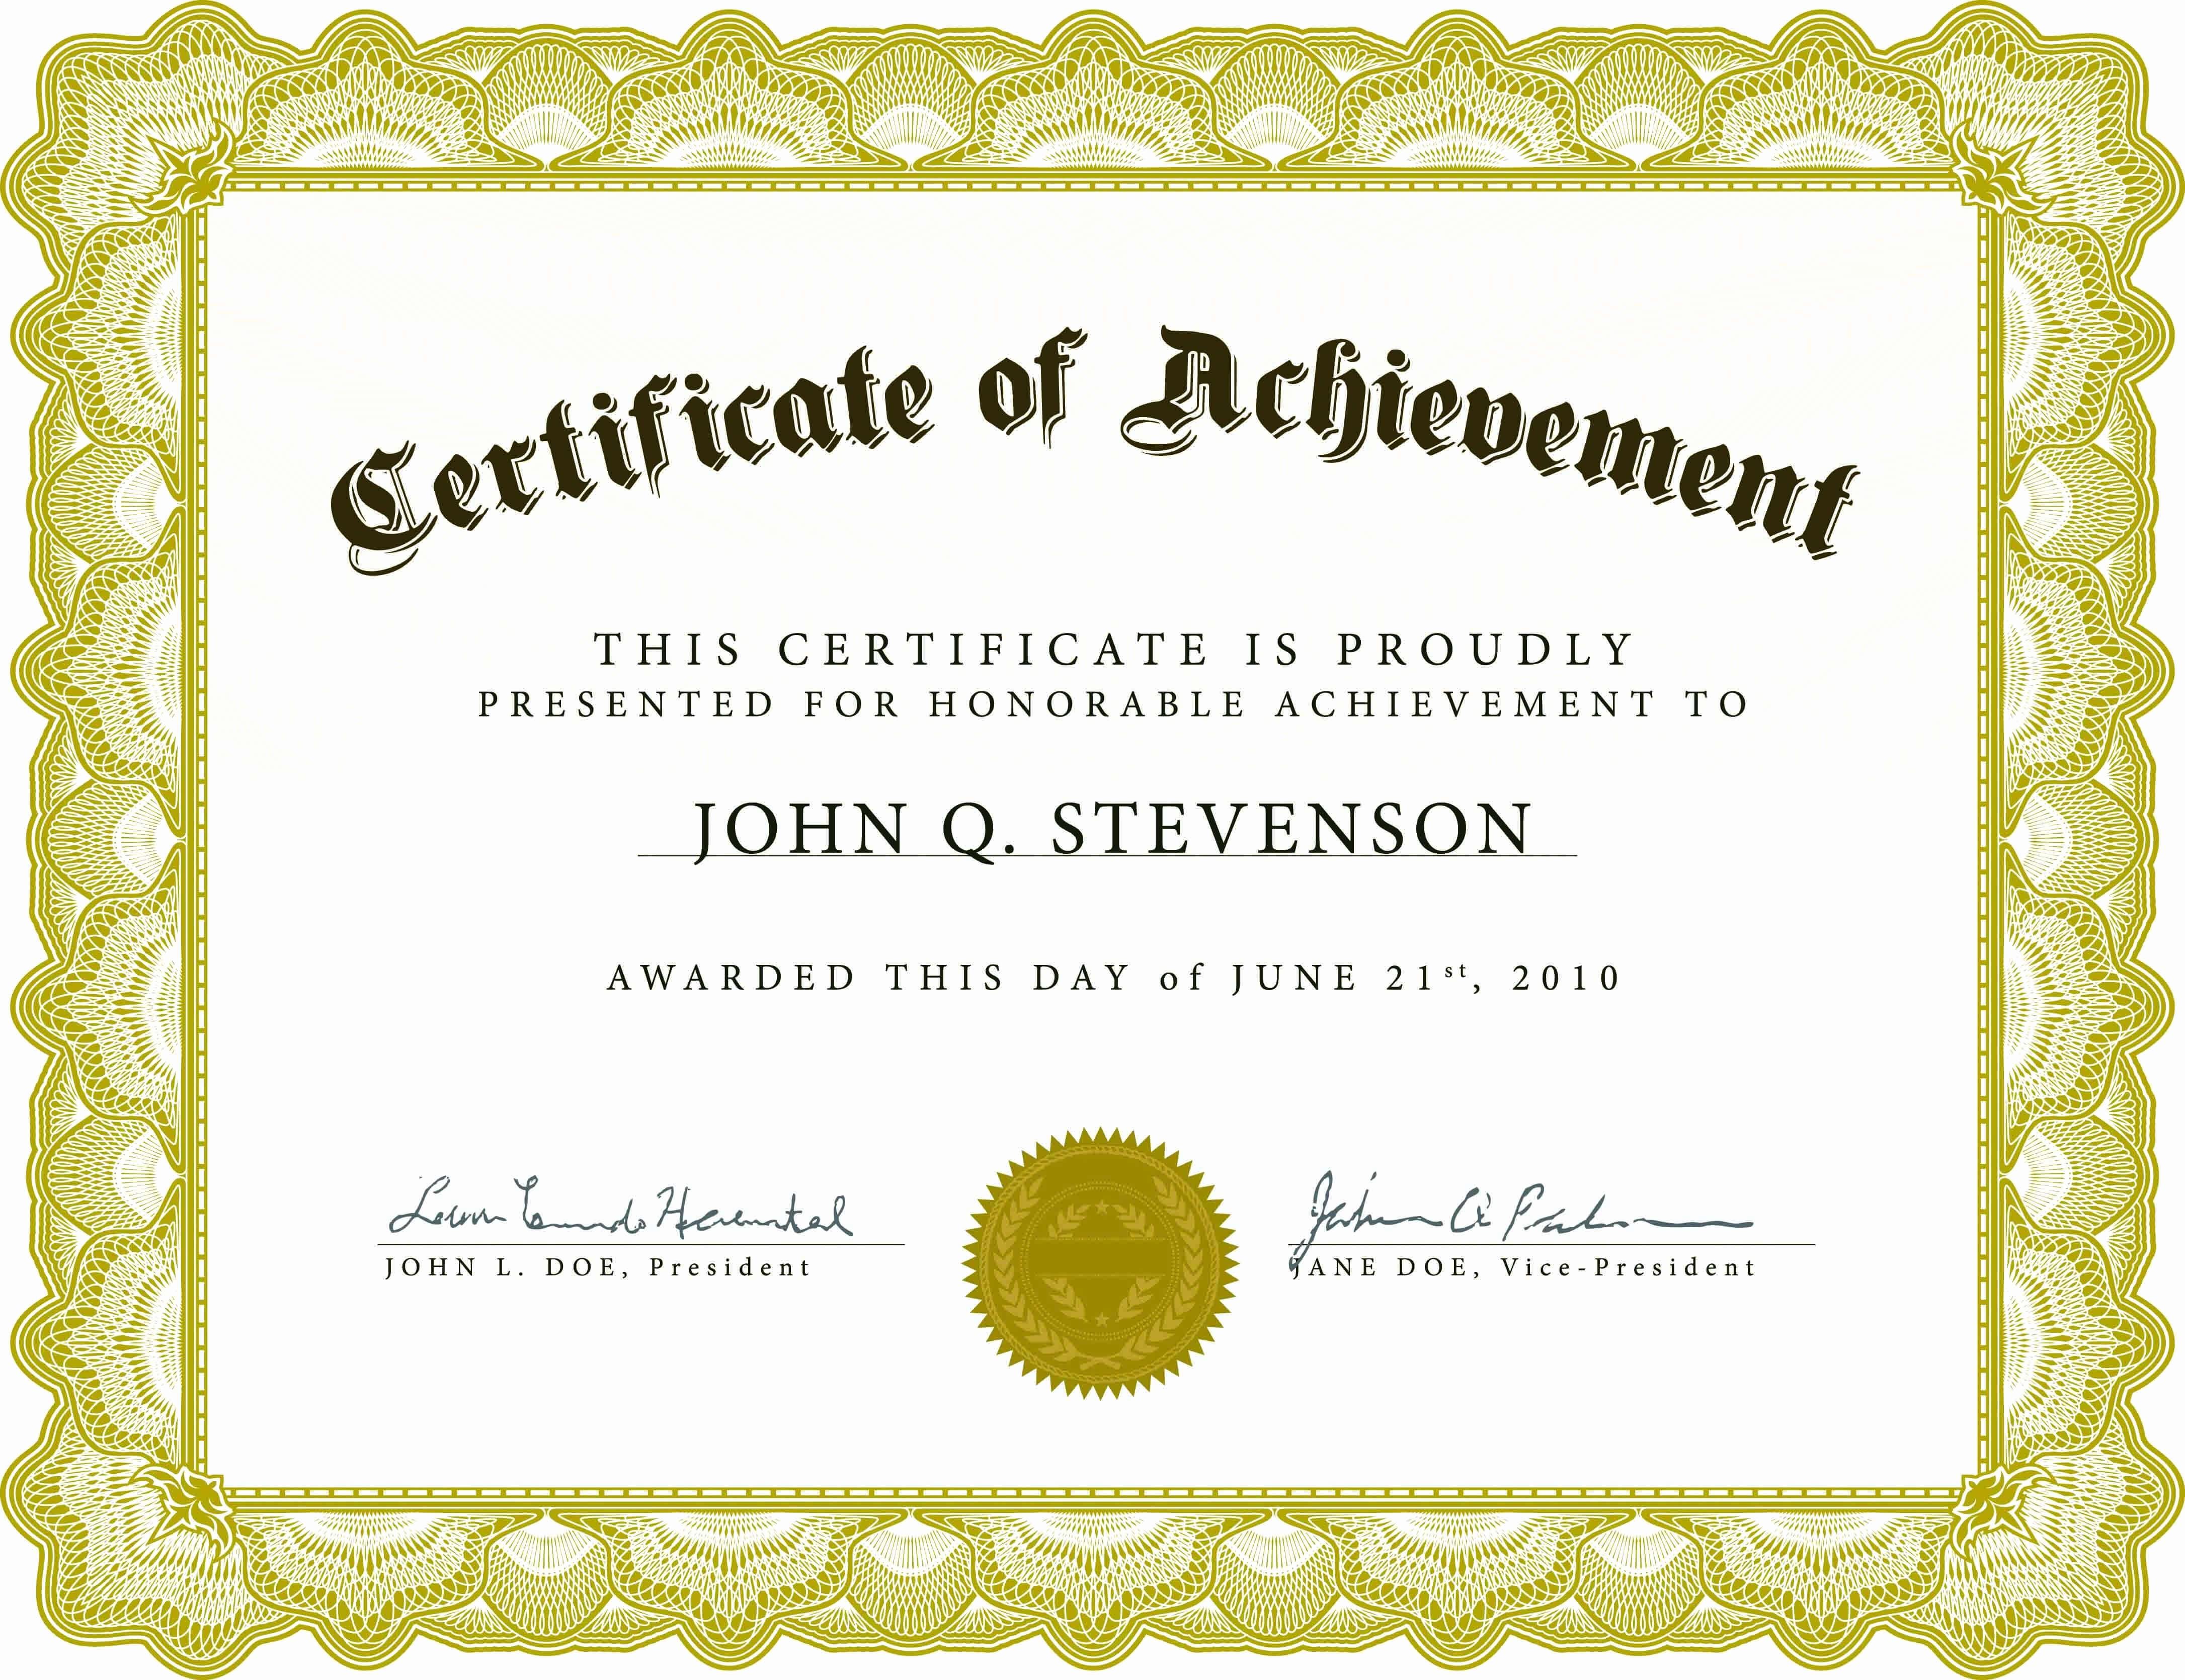 017 Certificates Of Appreciation Templates Certificate Word With Regard To Beautiful Certificate Templates